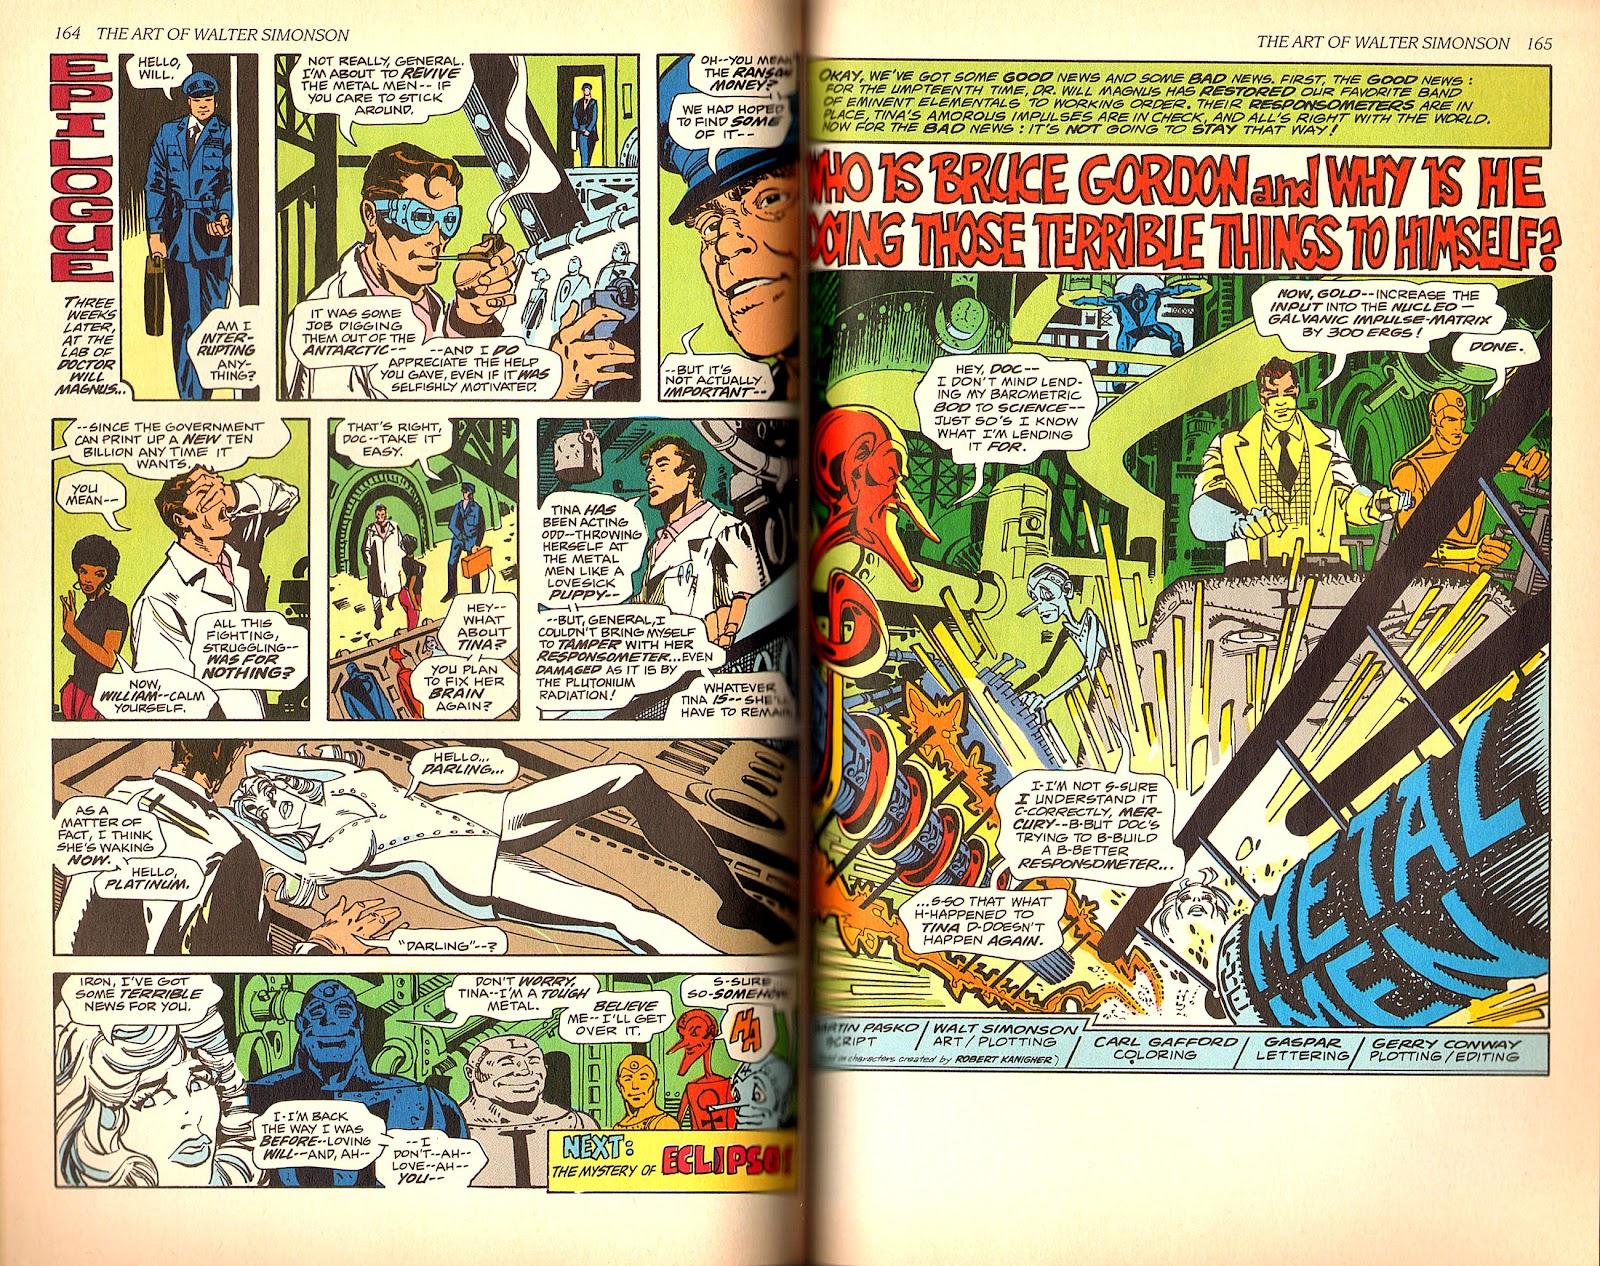 Read online The Art of Walter Simonson comic -  Issue # TPB - 84